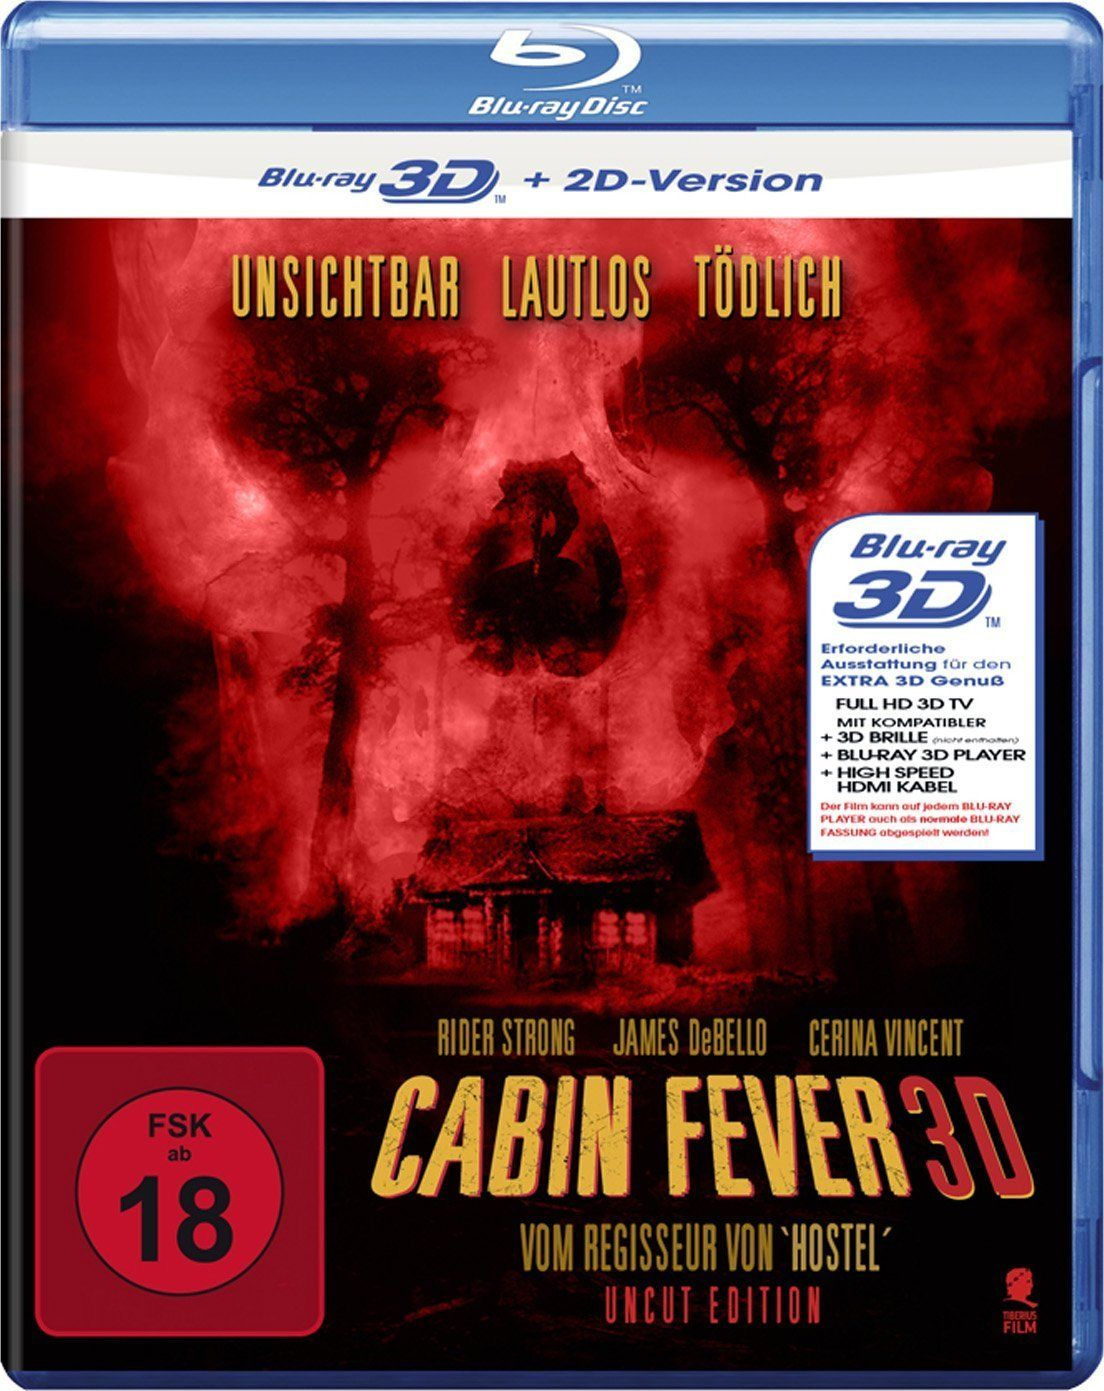 Cabin Fever (2002) ISO BDRA 3D 2D BluRay DD ITA DTS-HD ENG Sub - DDN